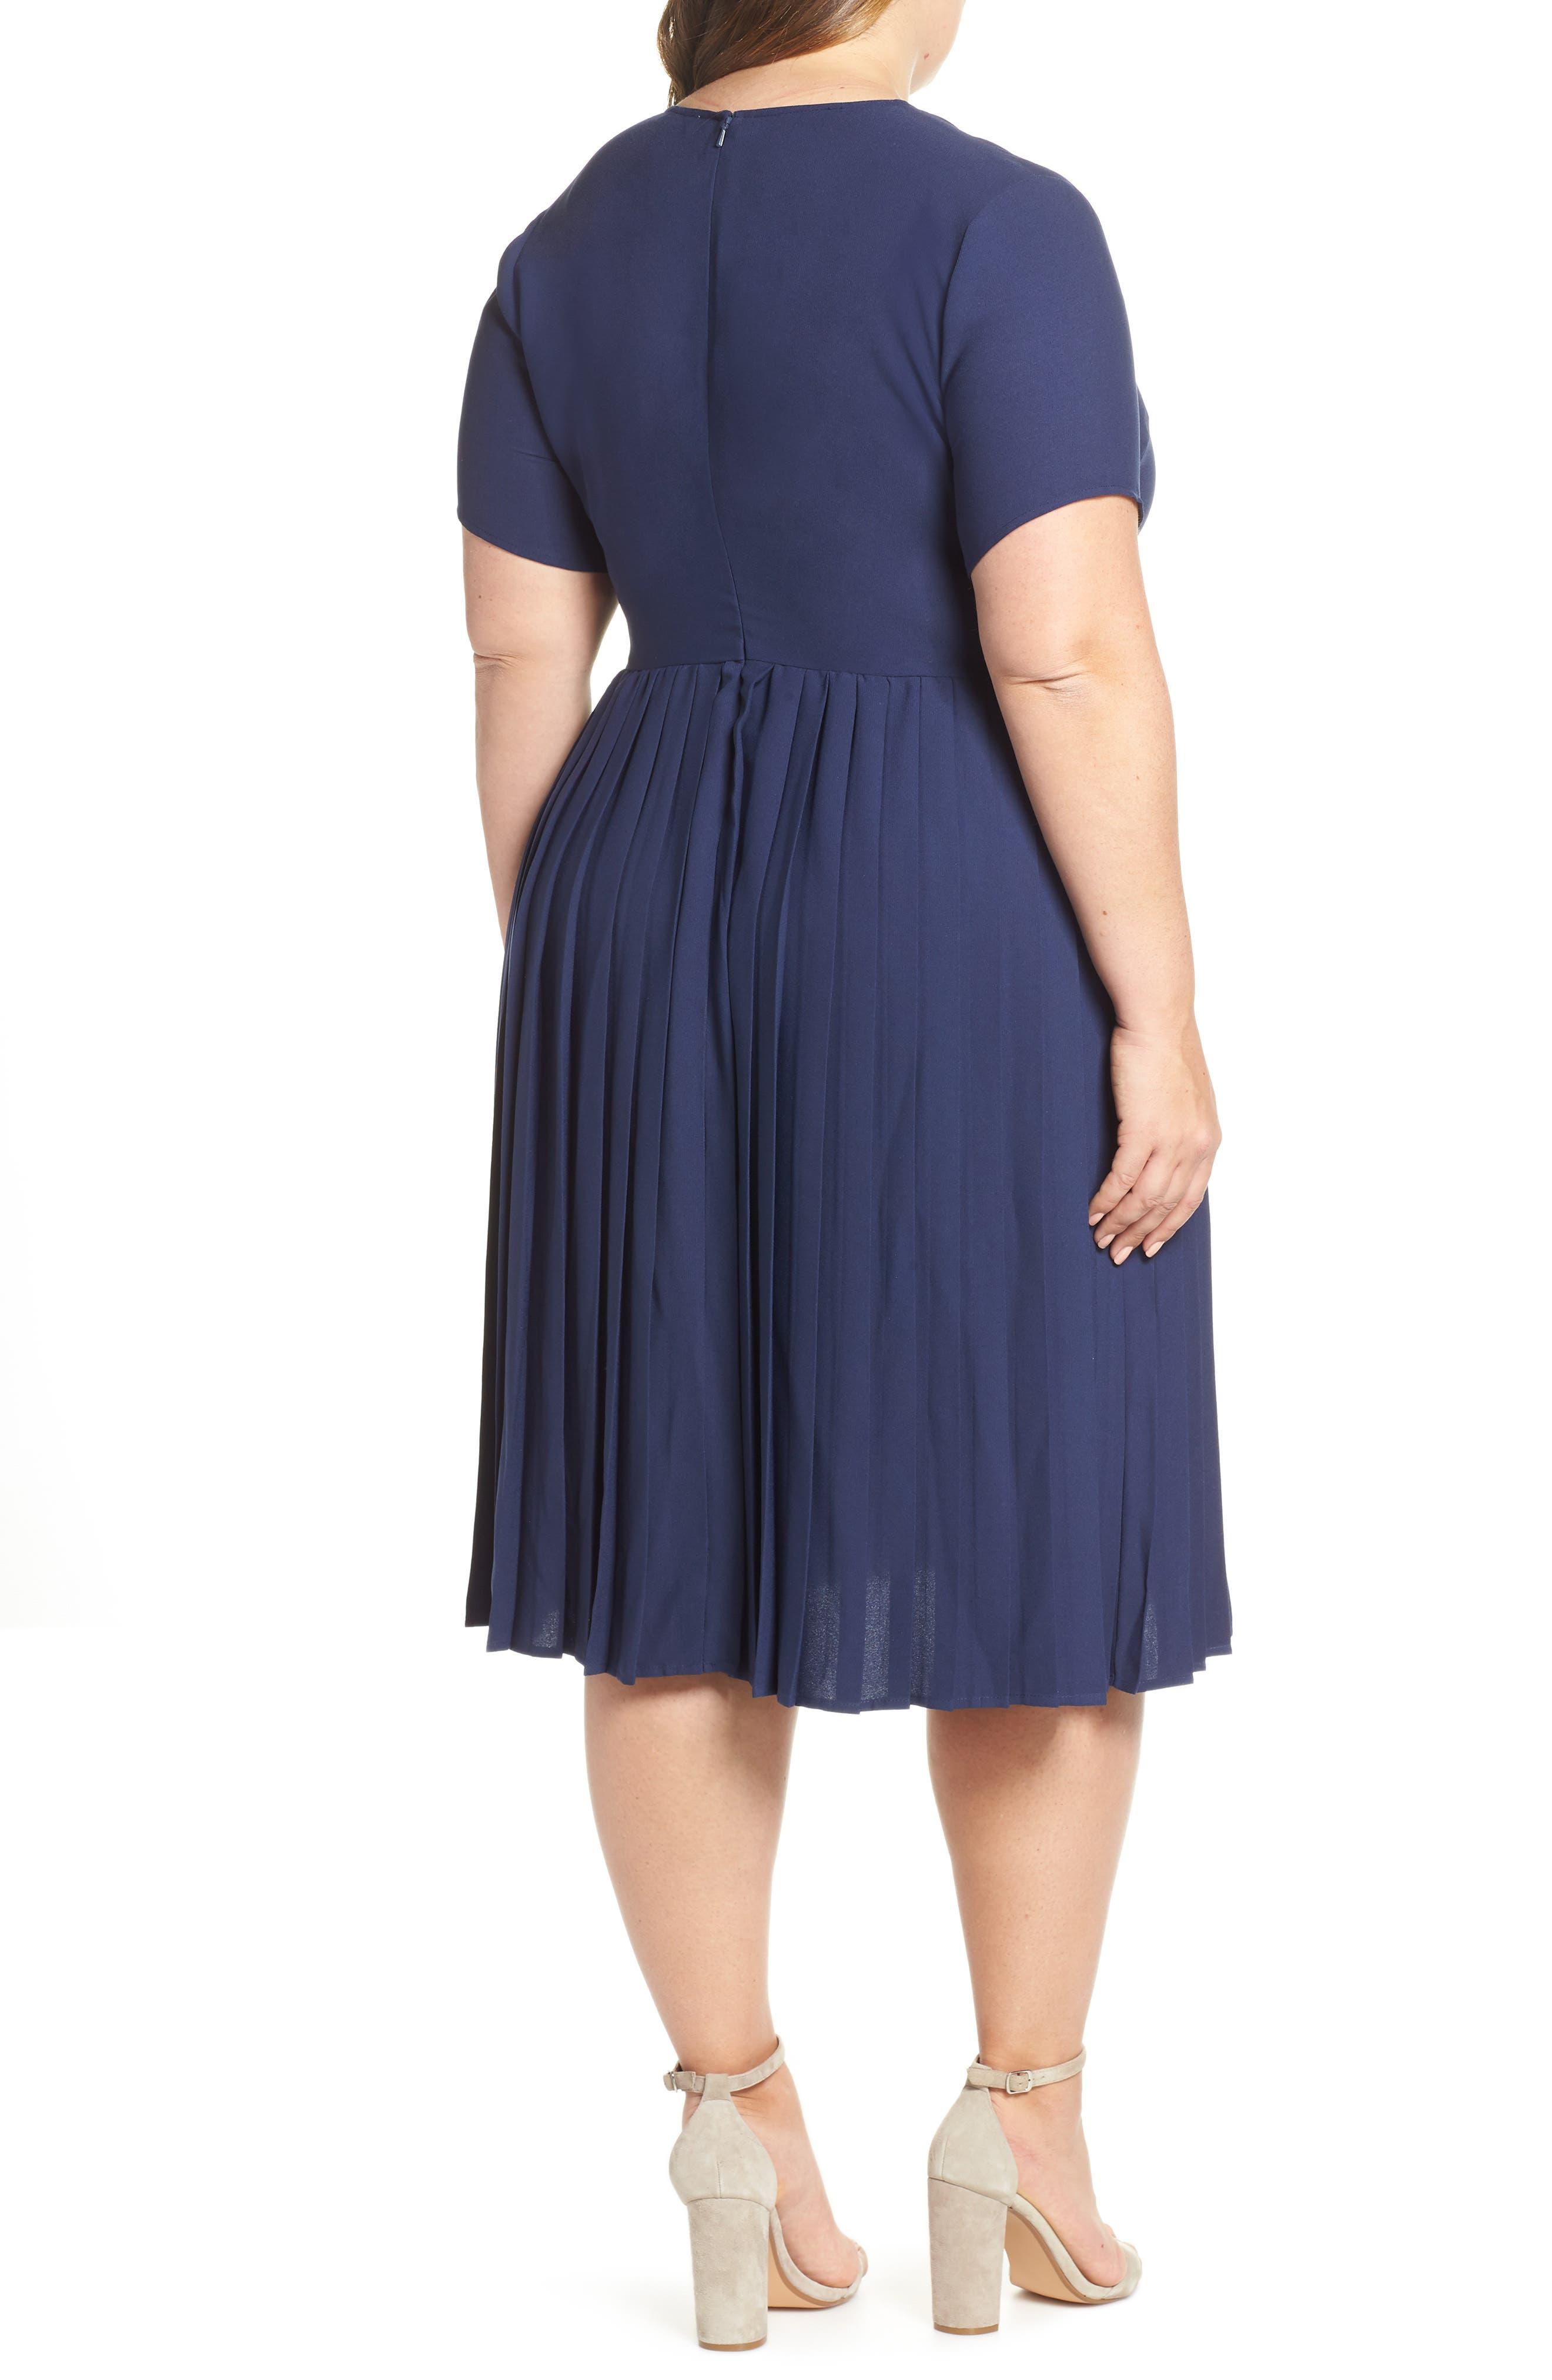 LEITH, Pleated Surplice Dress, Alternate thumbnail 9, color, NAVY PEACOAT